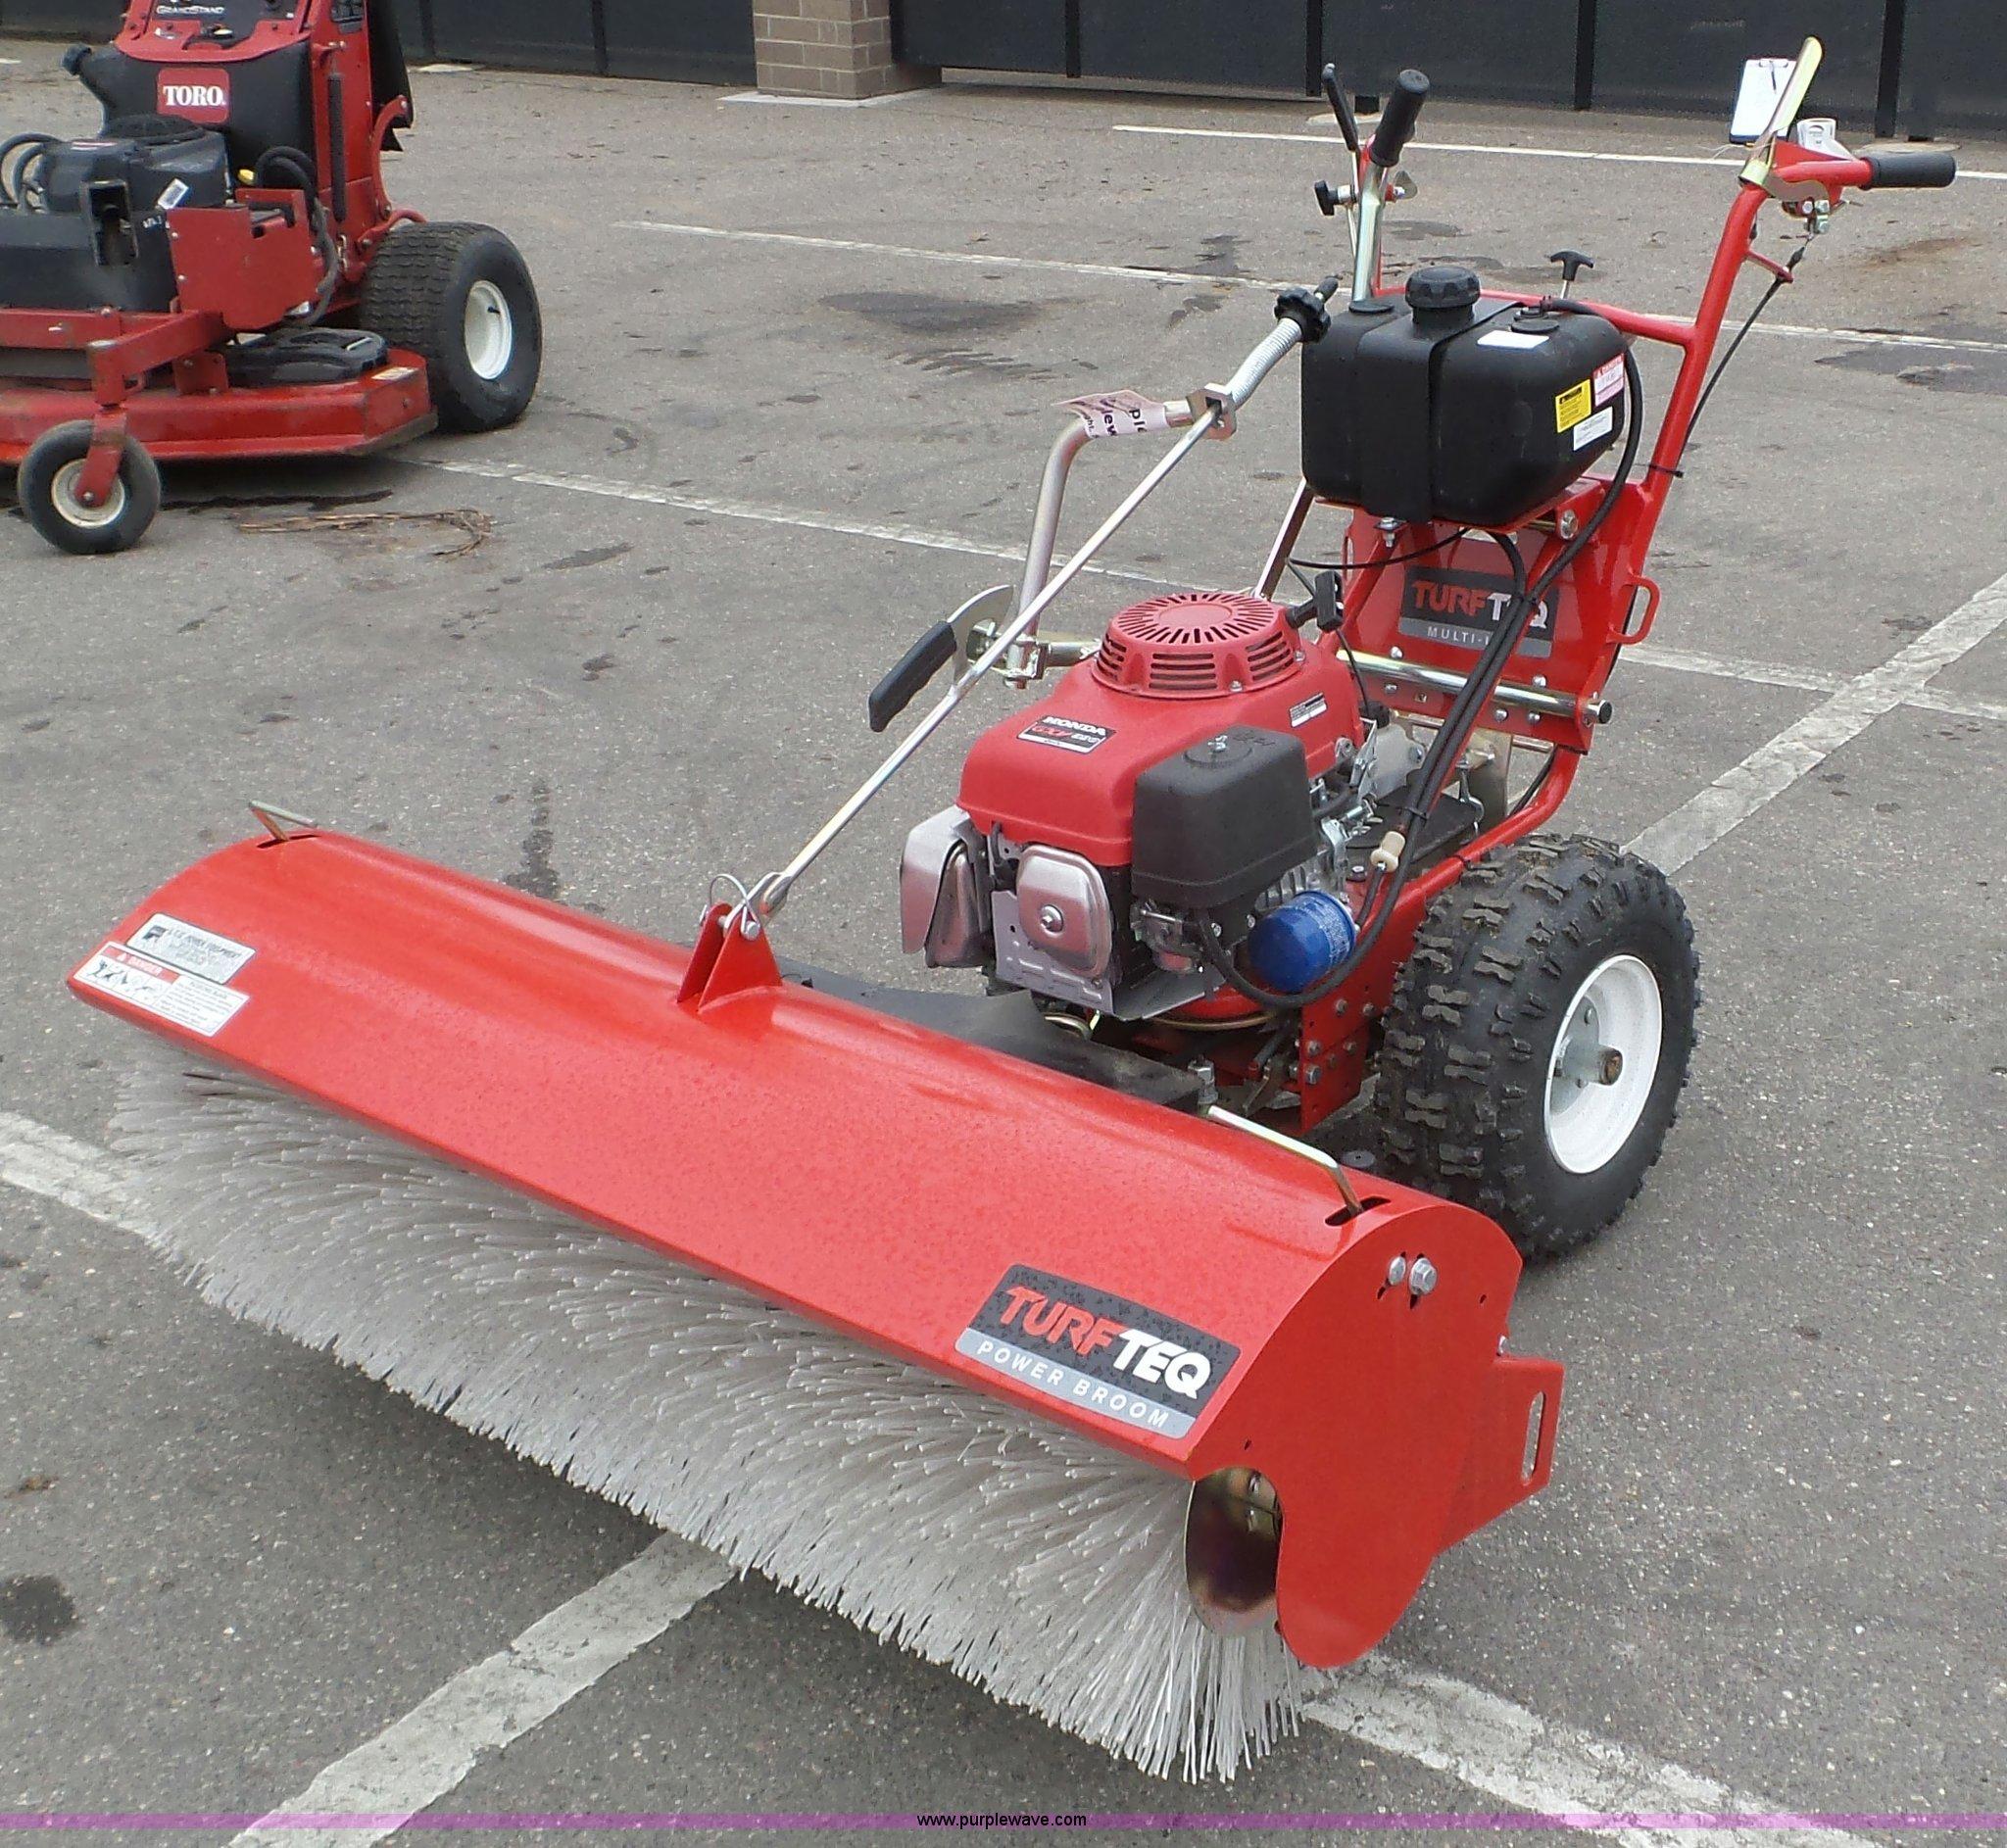 Turf Teq 1305 power broom | Item K4654 | SOLD! May 24 Tri-St